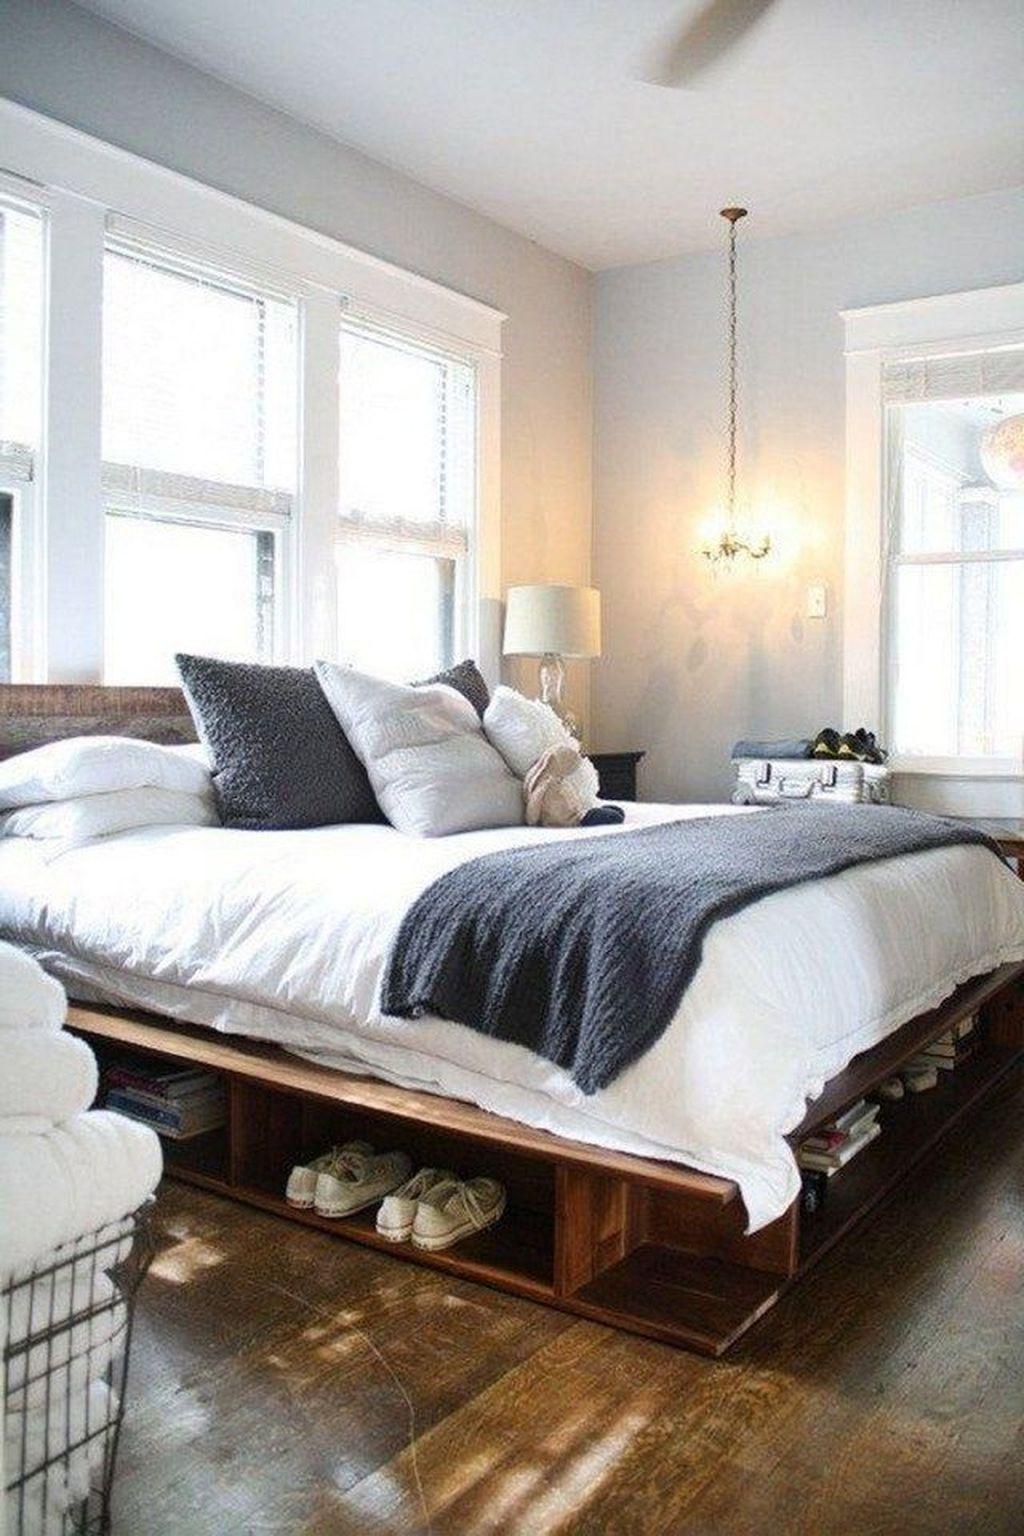 Decoomo Trends Home Decoration Ideas Bedroom Interior Bedroom Ideas For Small Rooms Diy Bed Design